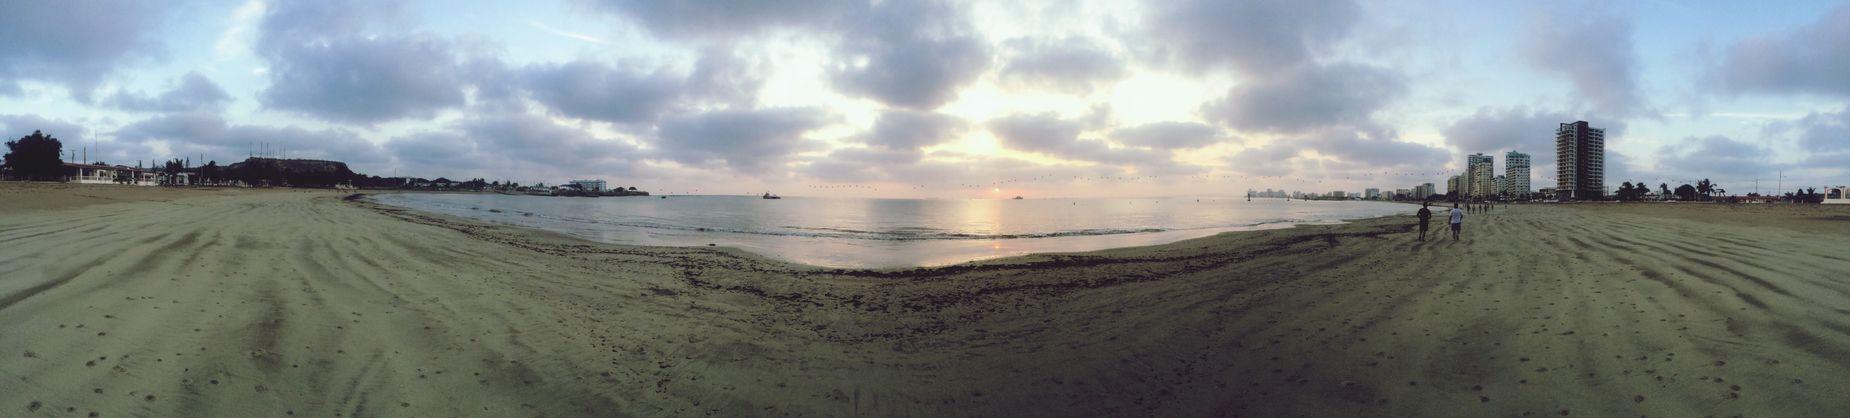 Amanecer Beach